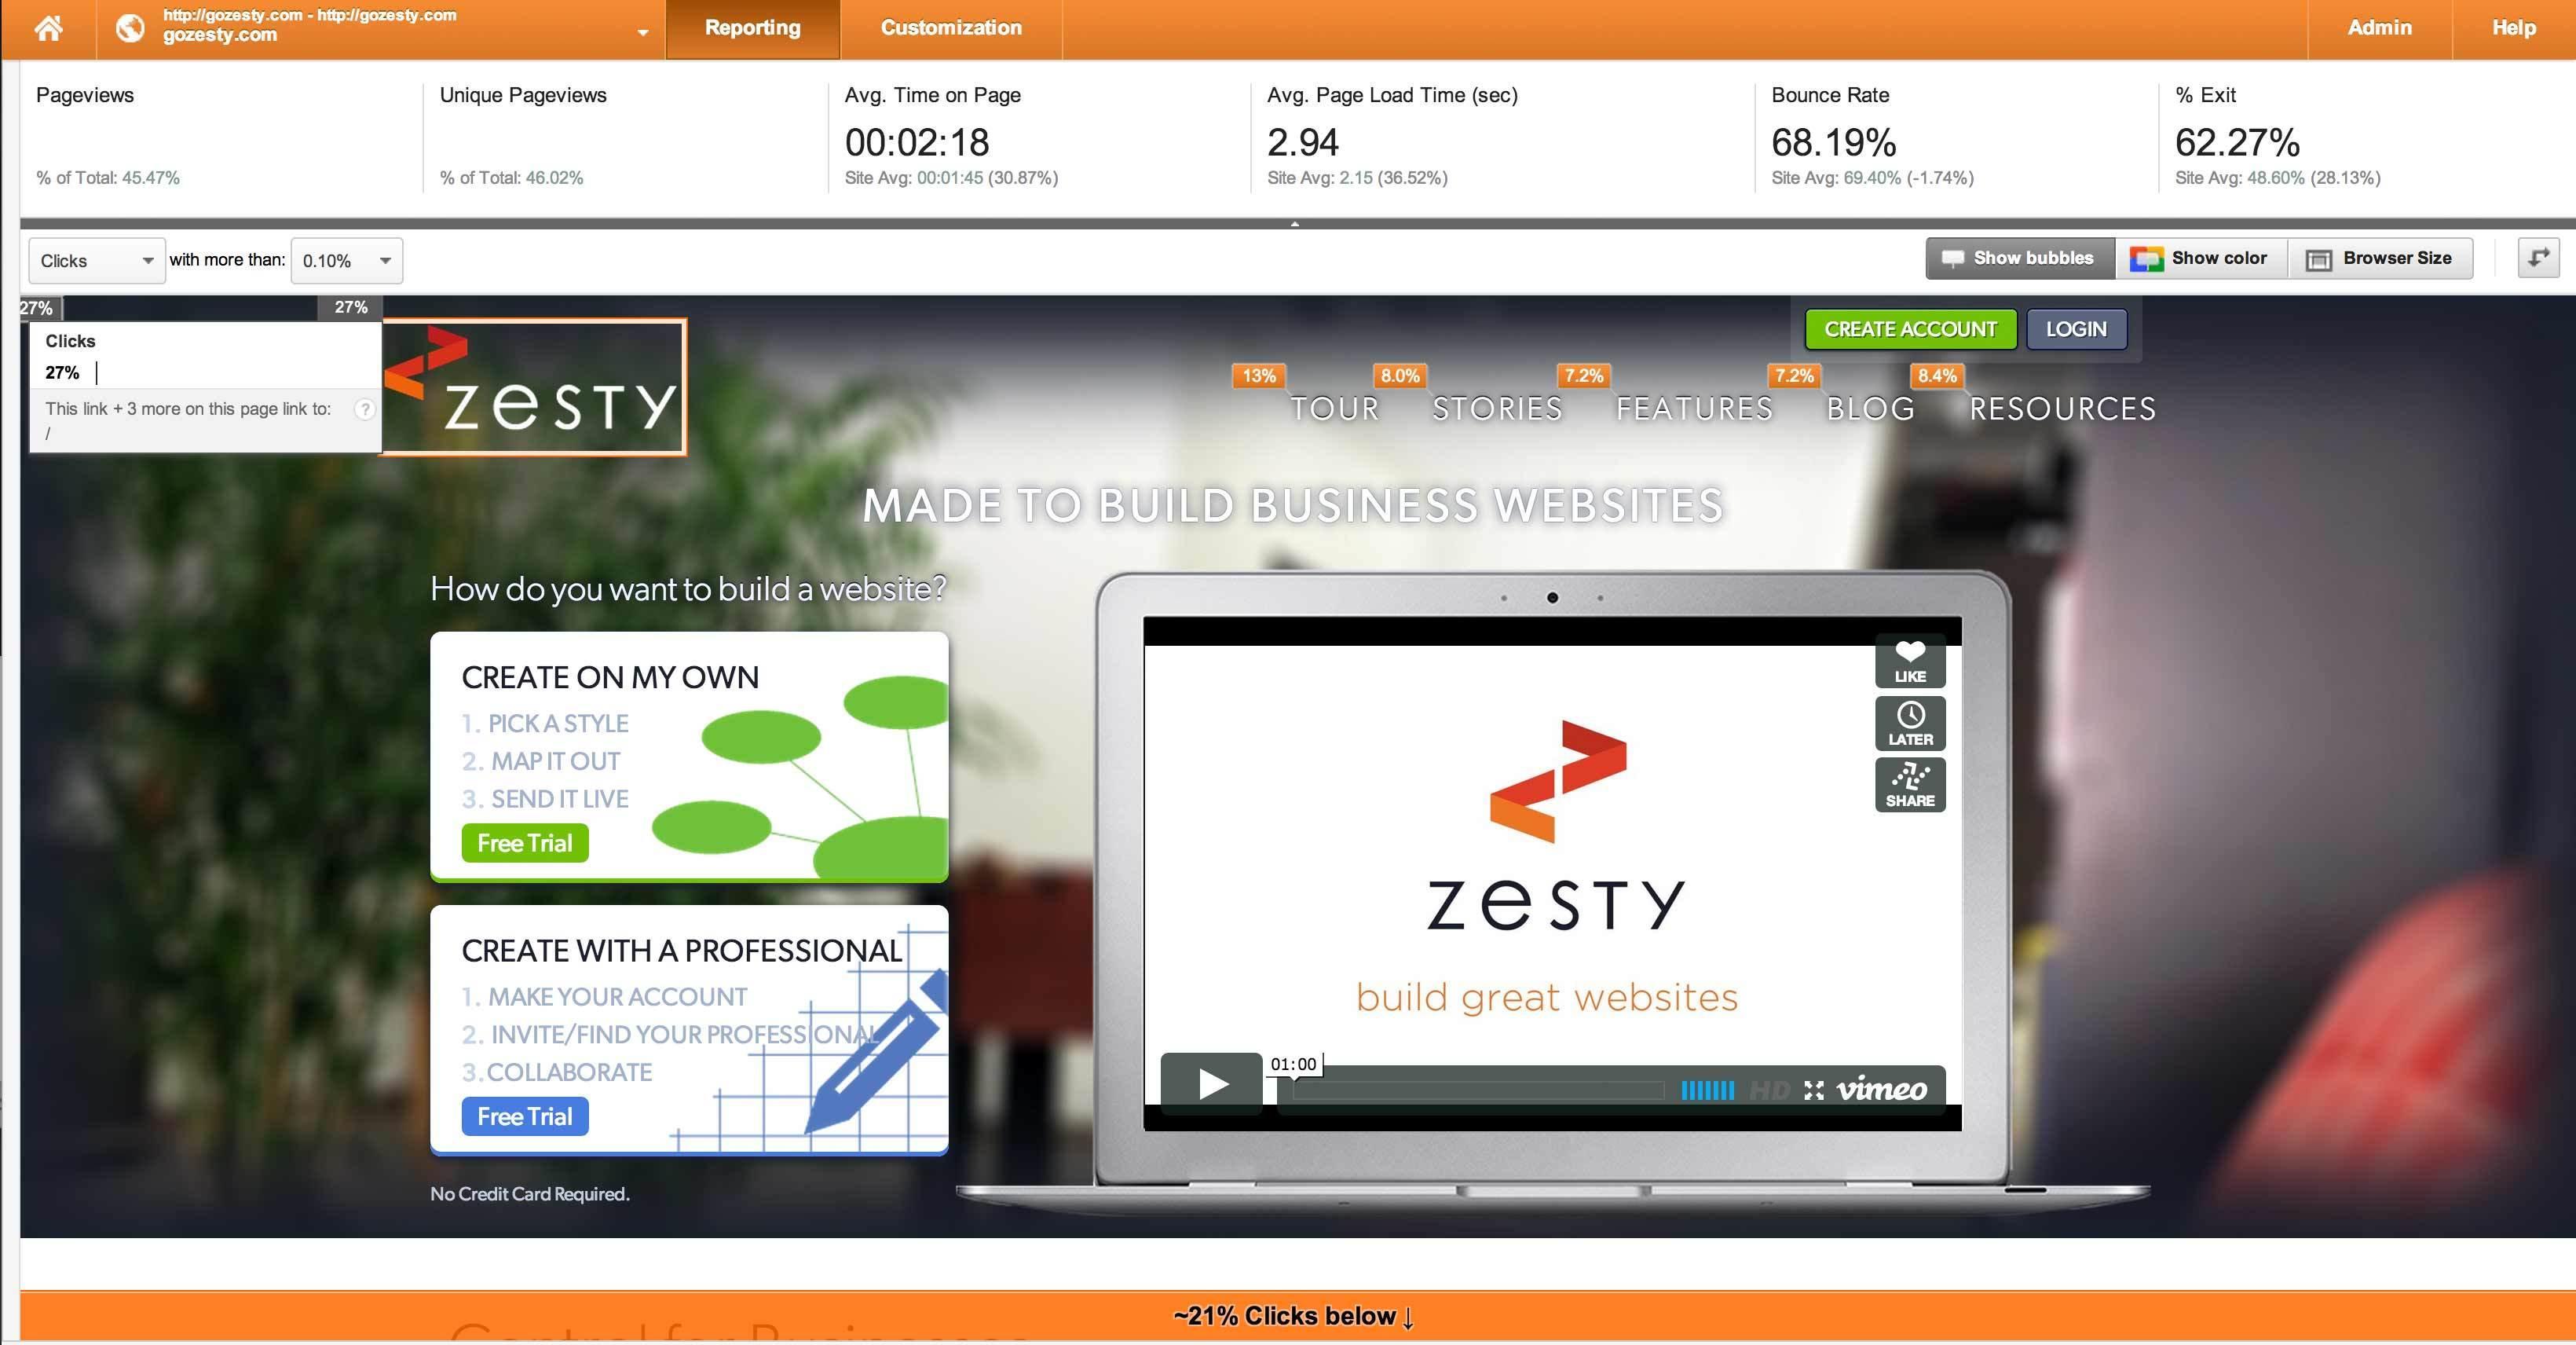 Design Broadhempston Clt Homepage Optimization For App Signup